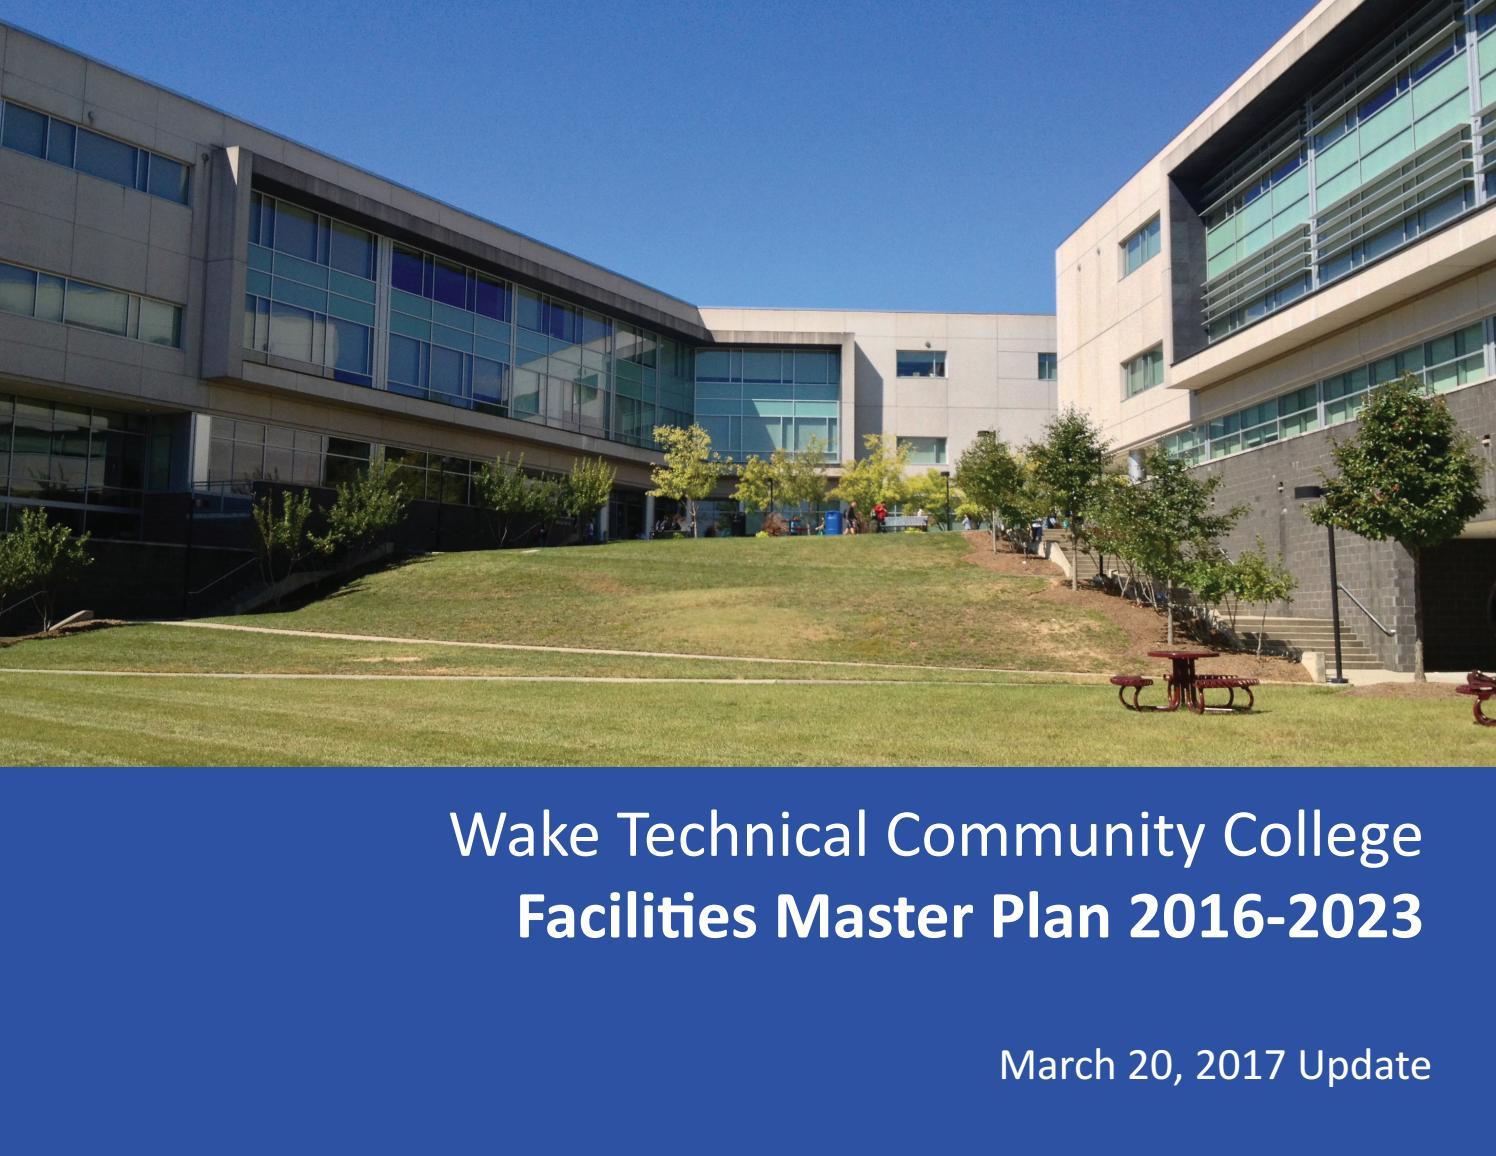 Wake Tech Master Plan 2017 by Wake Tech Community College